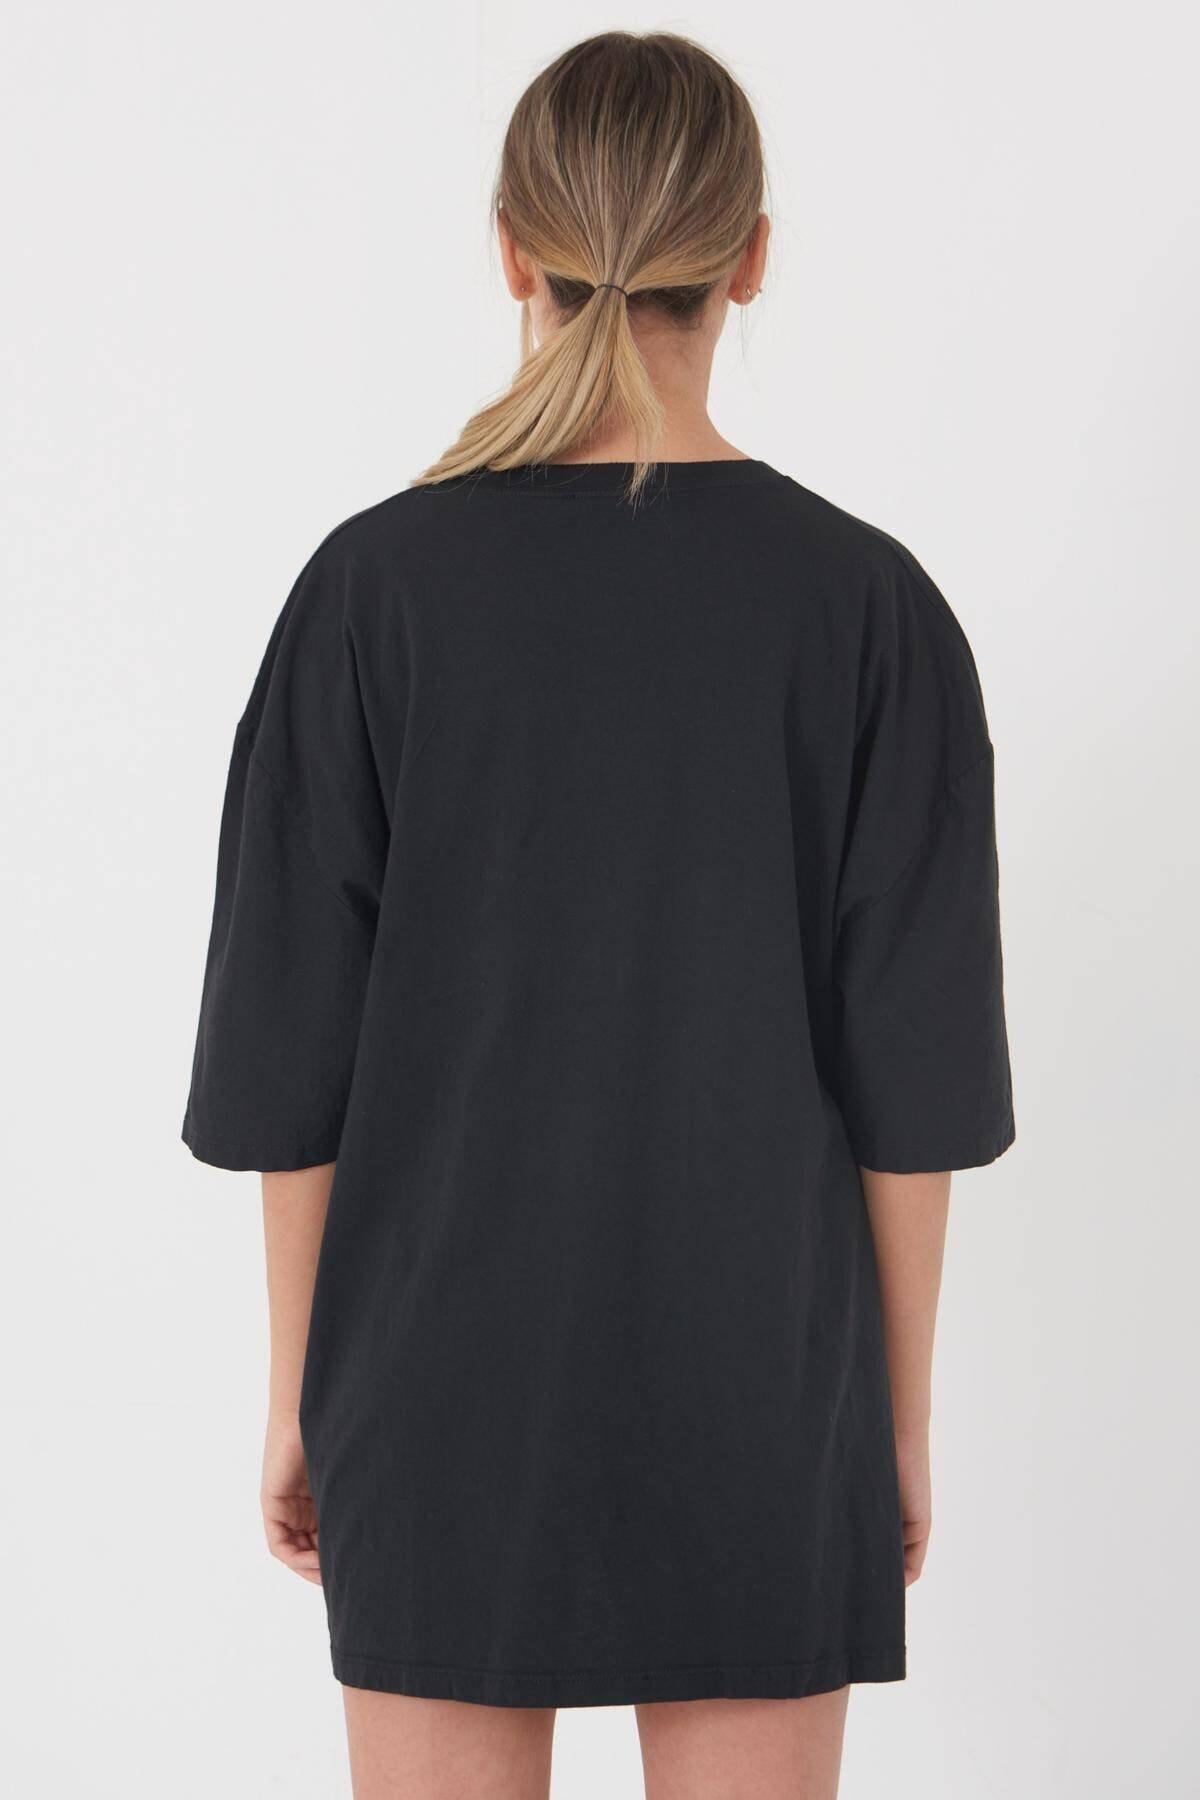 Addax Kadın Füme Baskılı T-Shirt P9420 - C5 Adx-0000022126 4